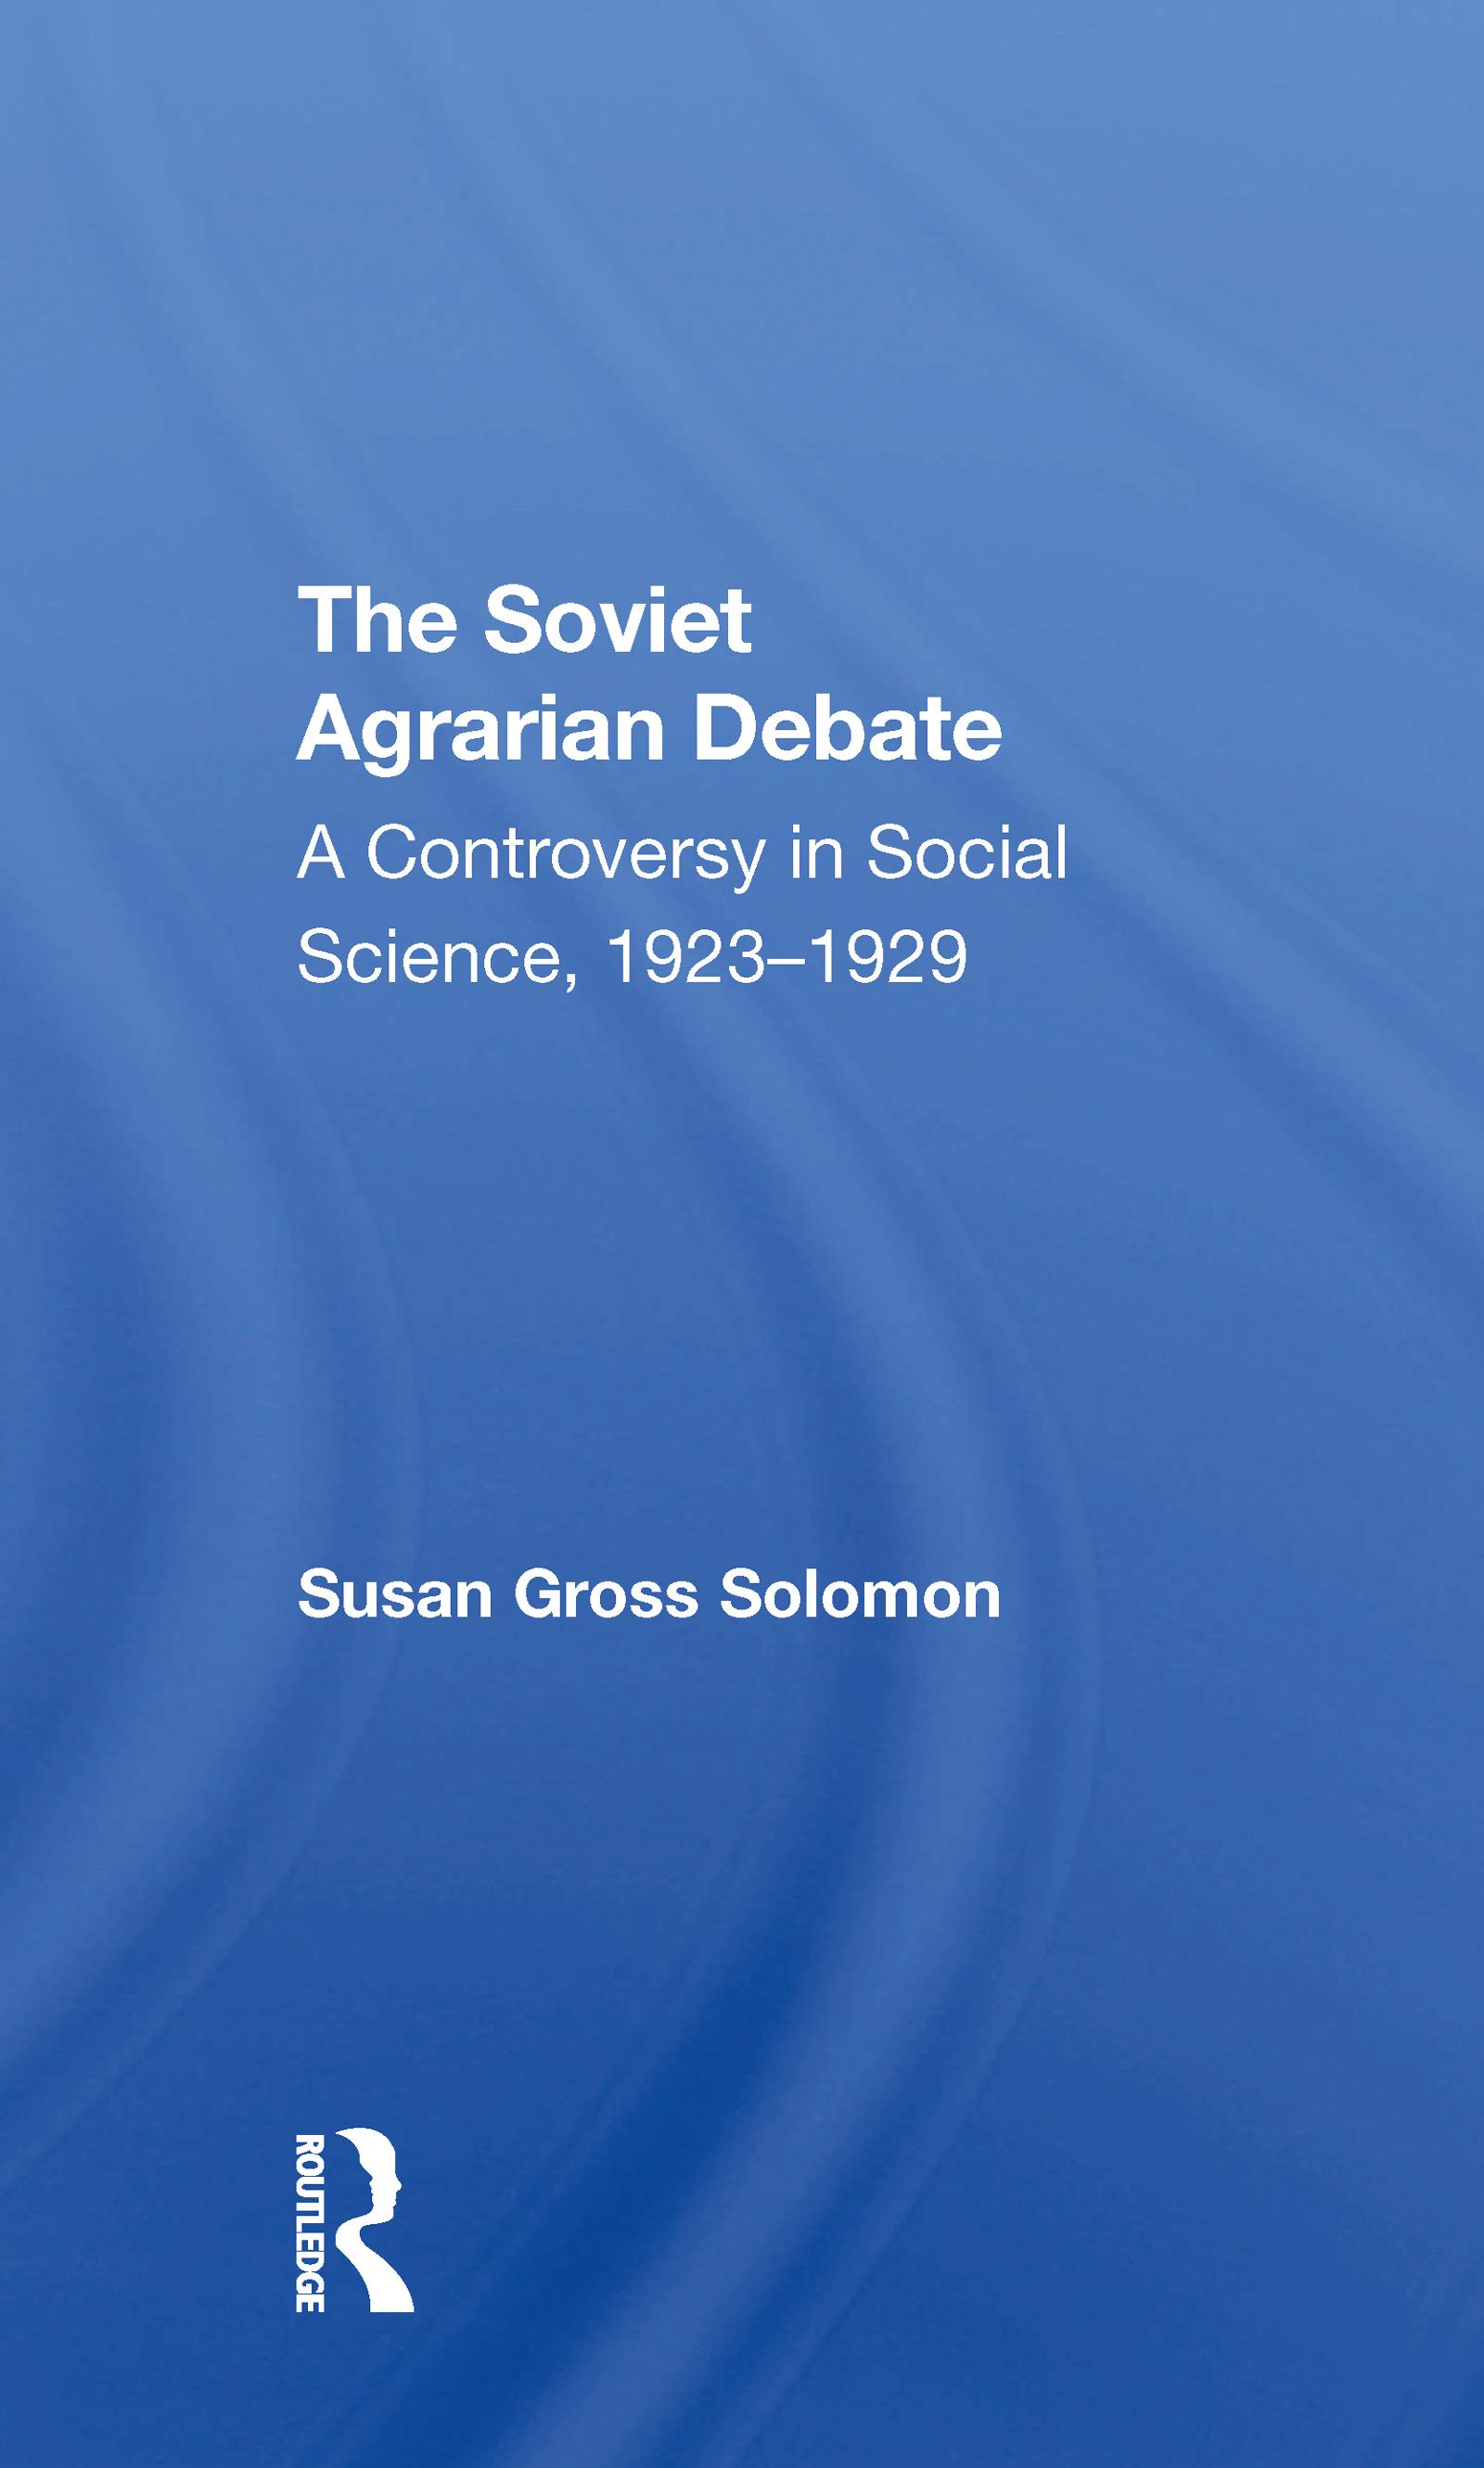 The Soviet Agrarian Debate